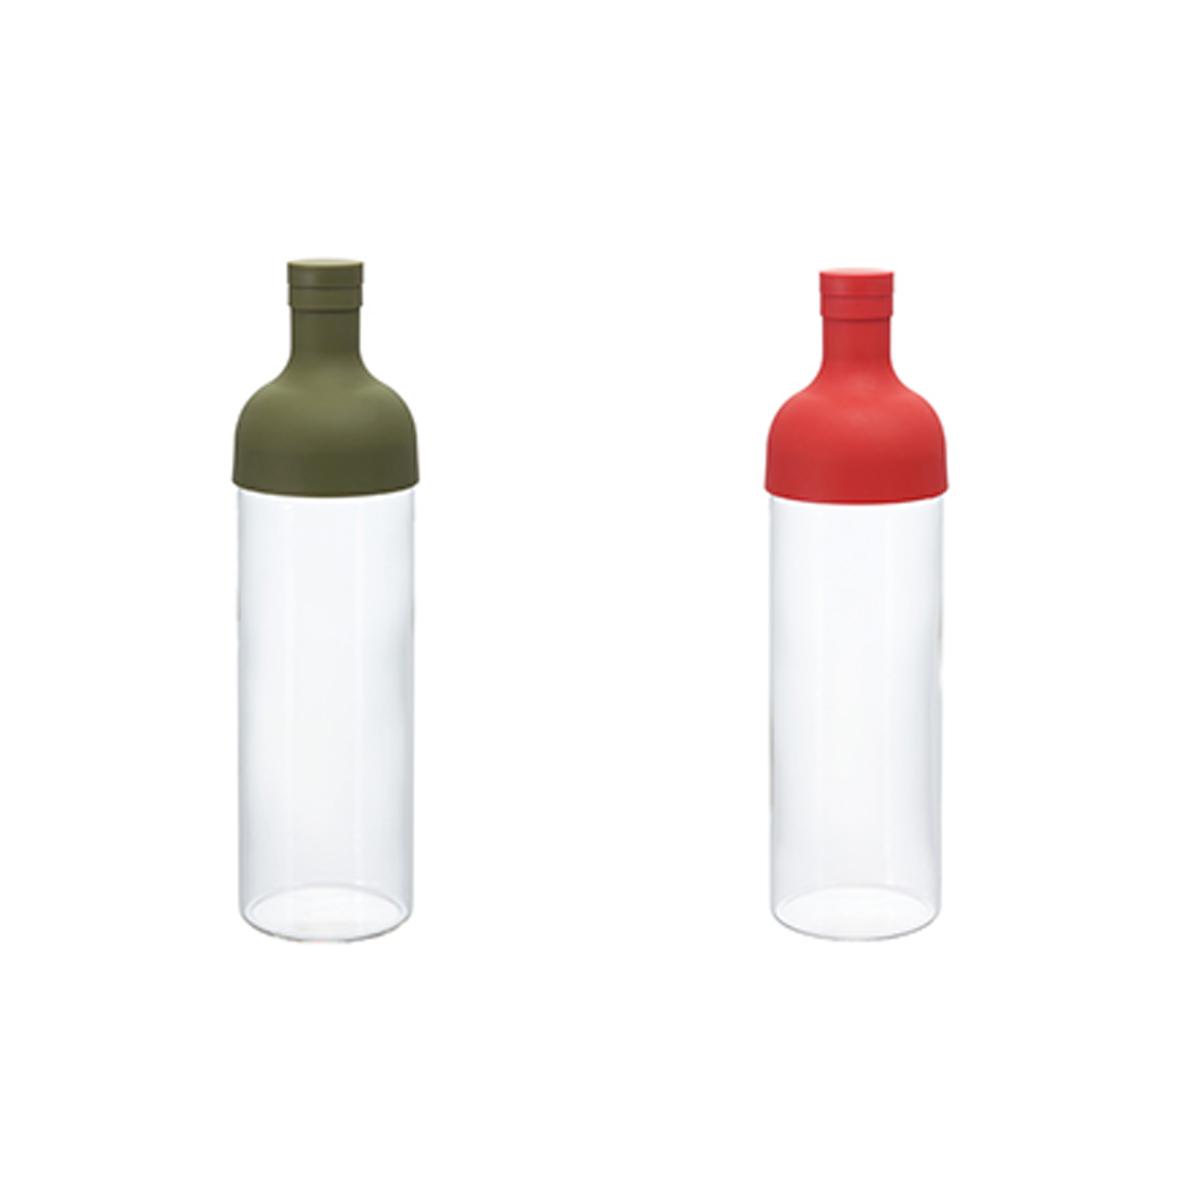 Filter-In-Bottle